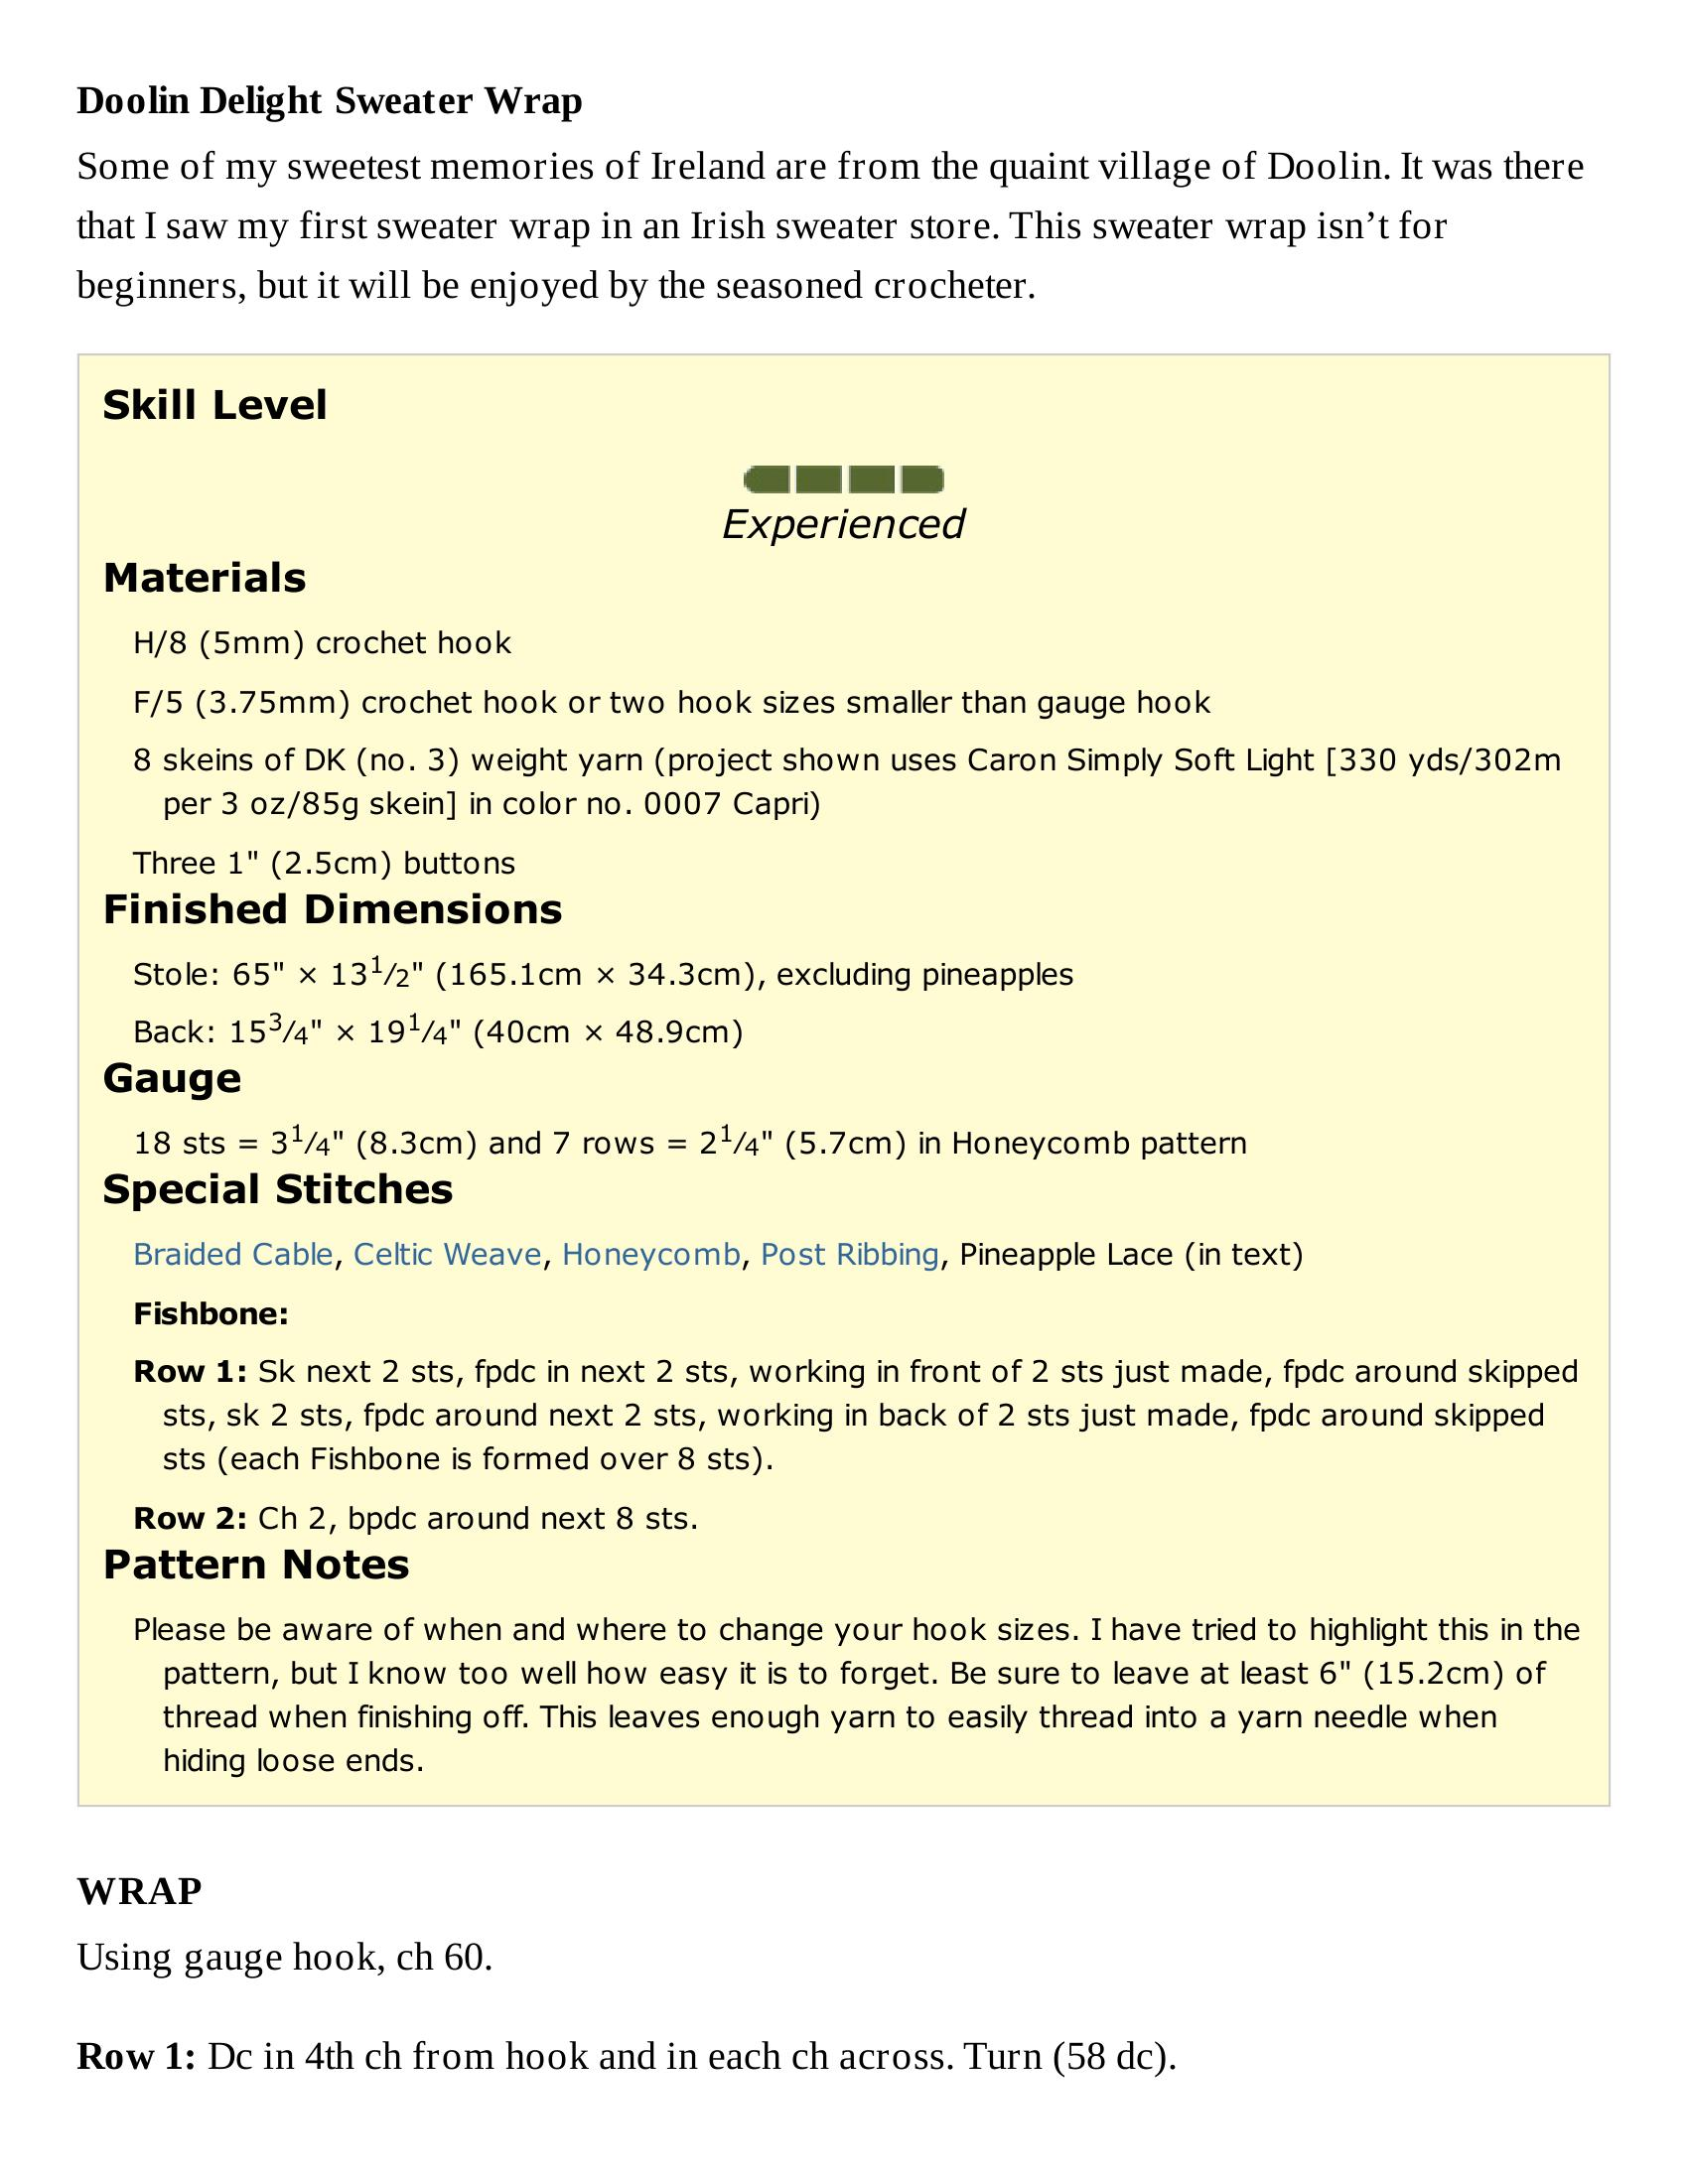 CONTEMPORARY CELTIC CROCHET 当代凯尔特钩针 - 编织幸福 - 编织幸福的博客